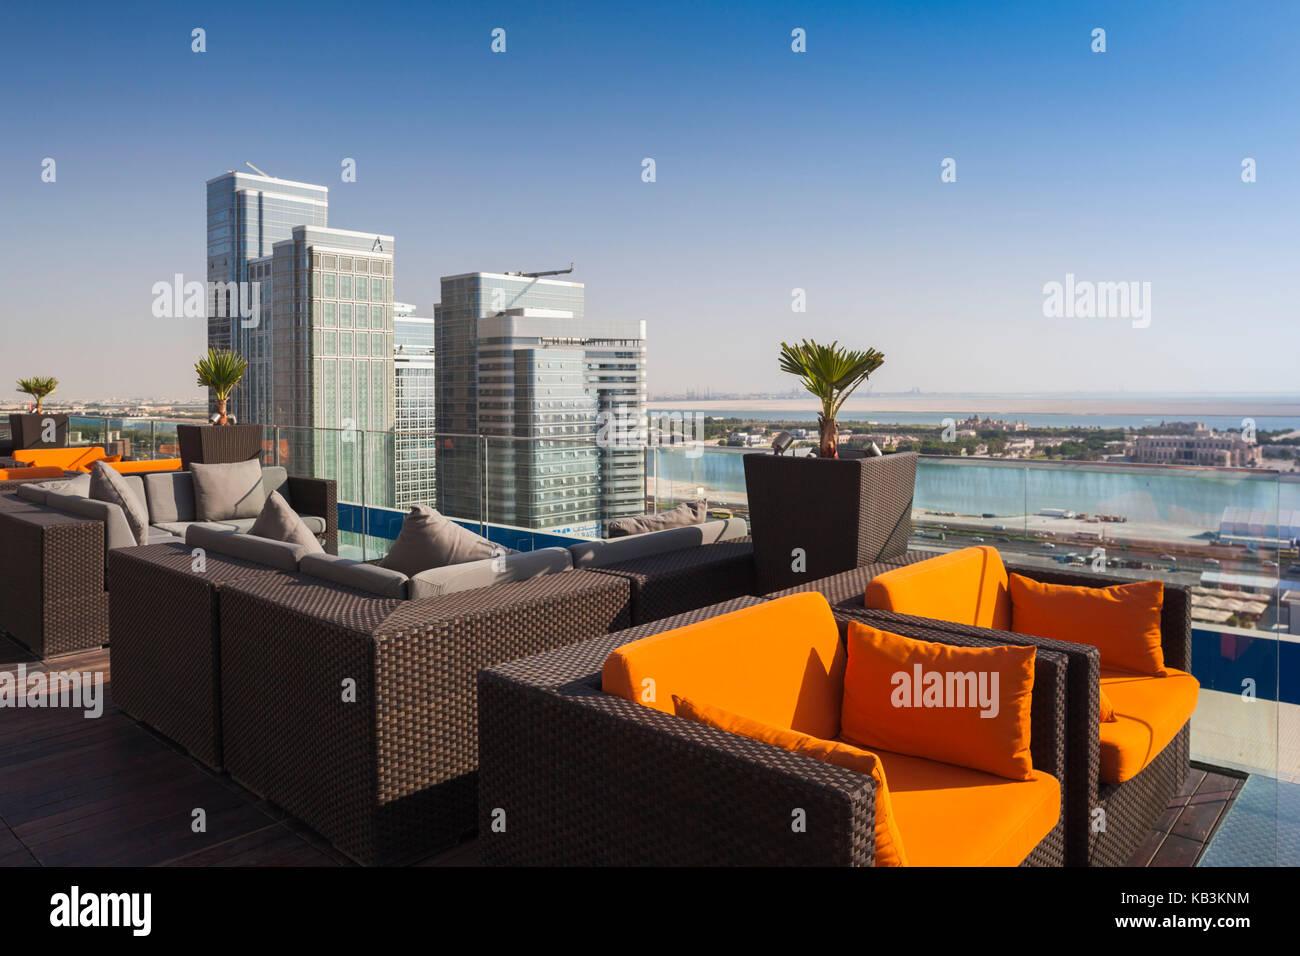 UAE, Abu Dhabi, Al Safarat Embassy Area, bar atop the Aloft Hotel - Stock Image